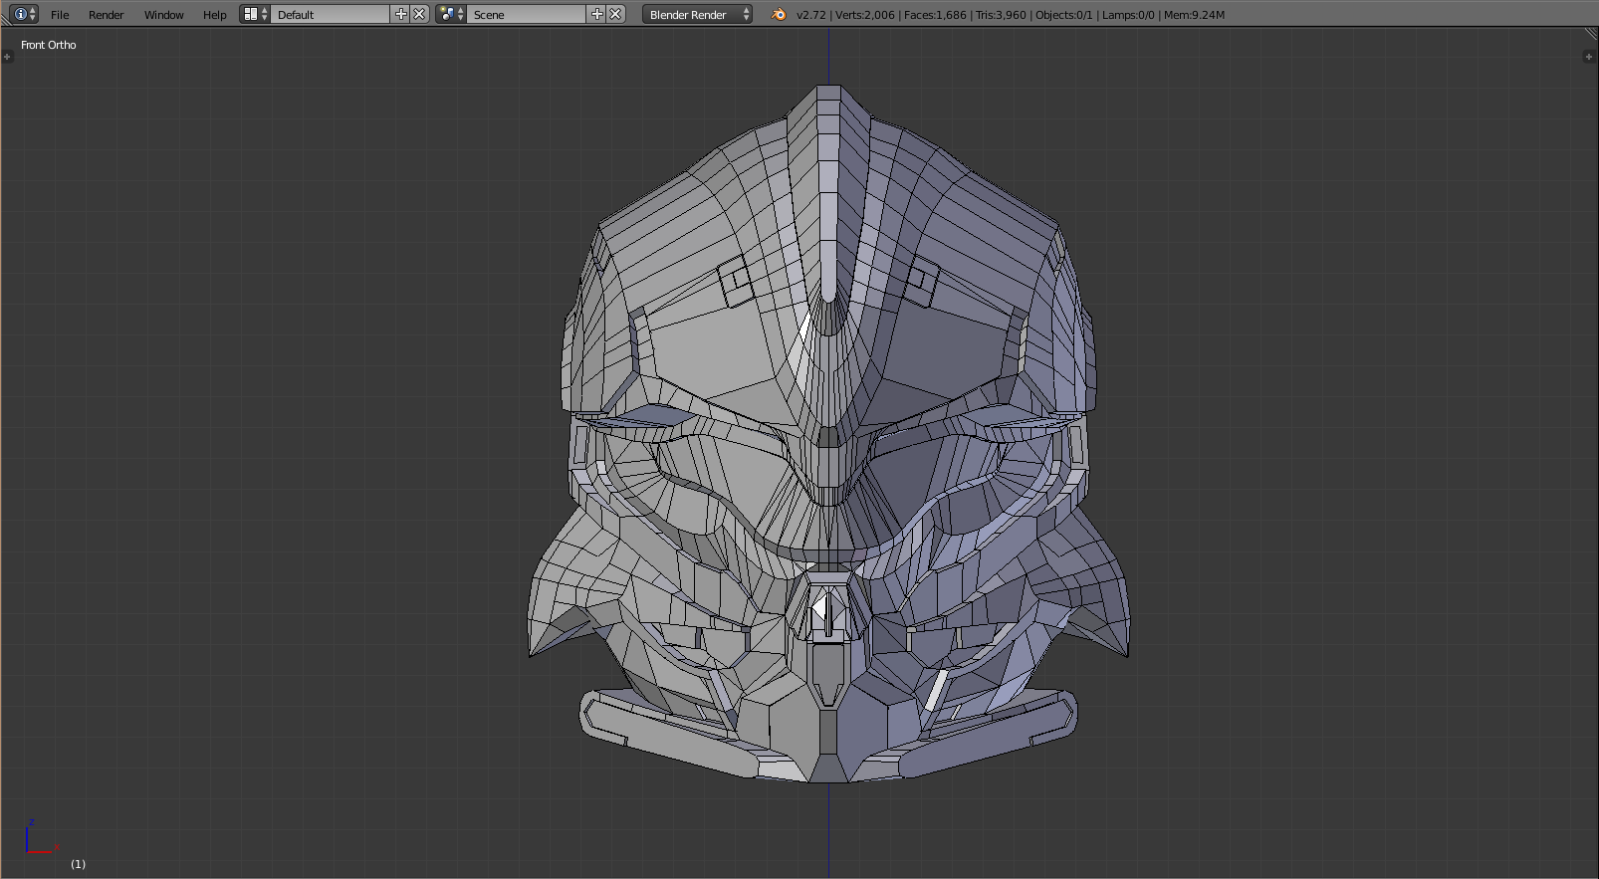 Halo 5: Guardians Beta Armor (Helioskrill) | Halo Costume